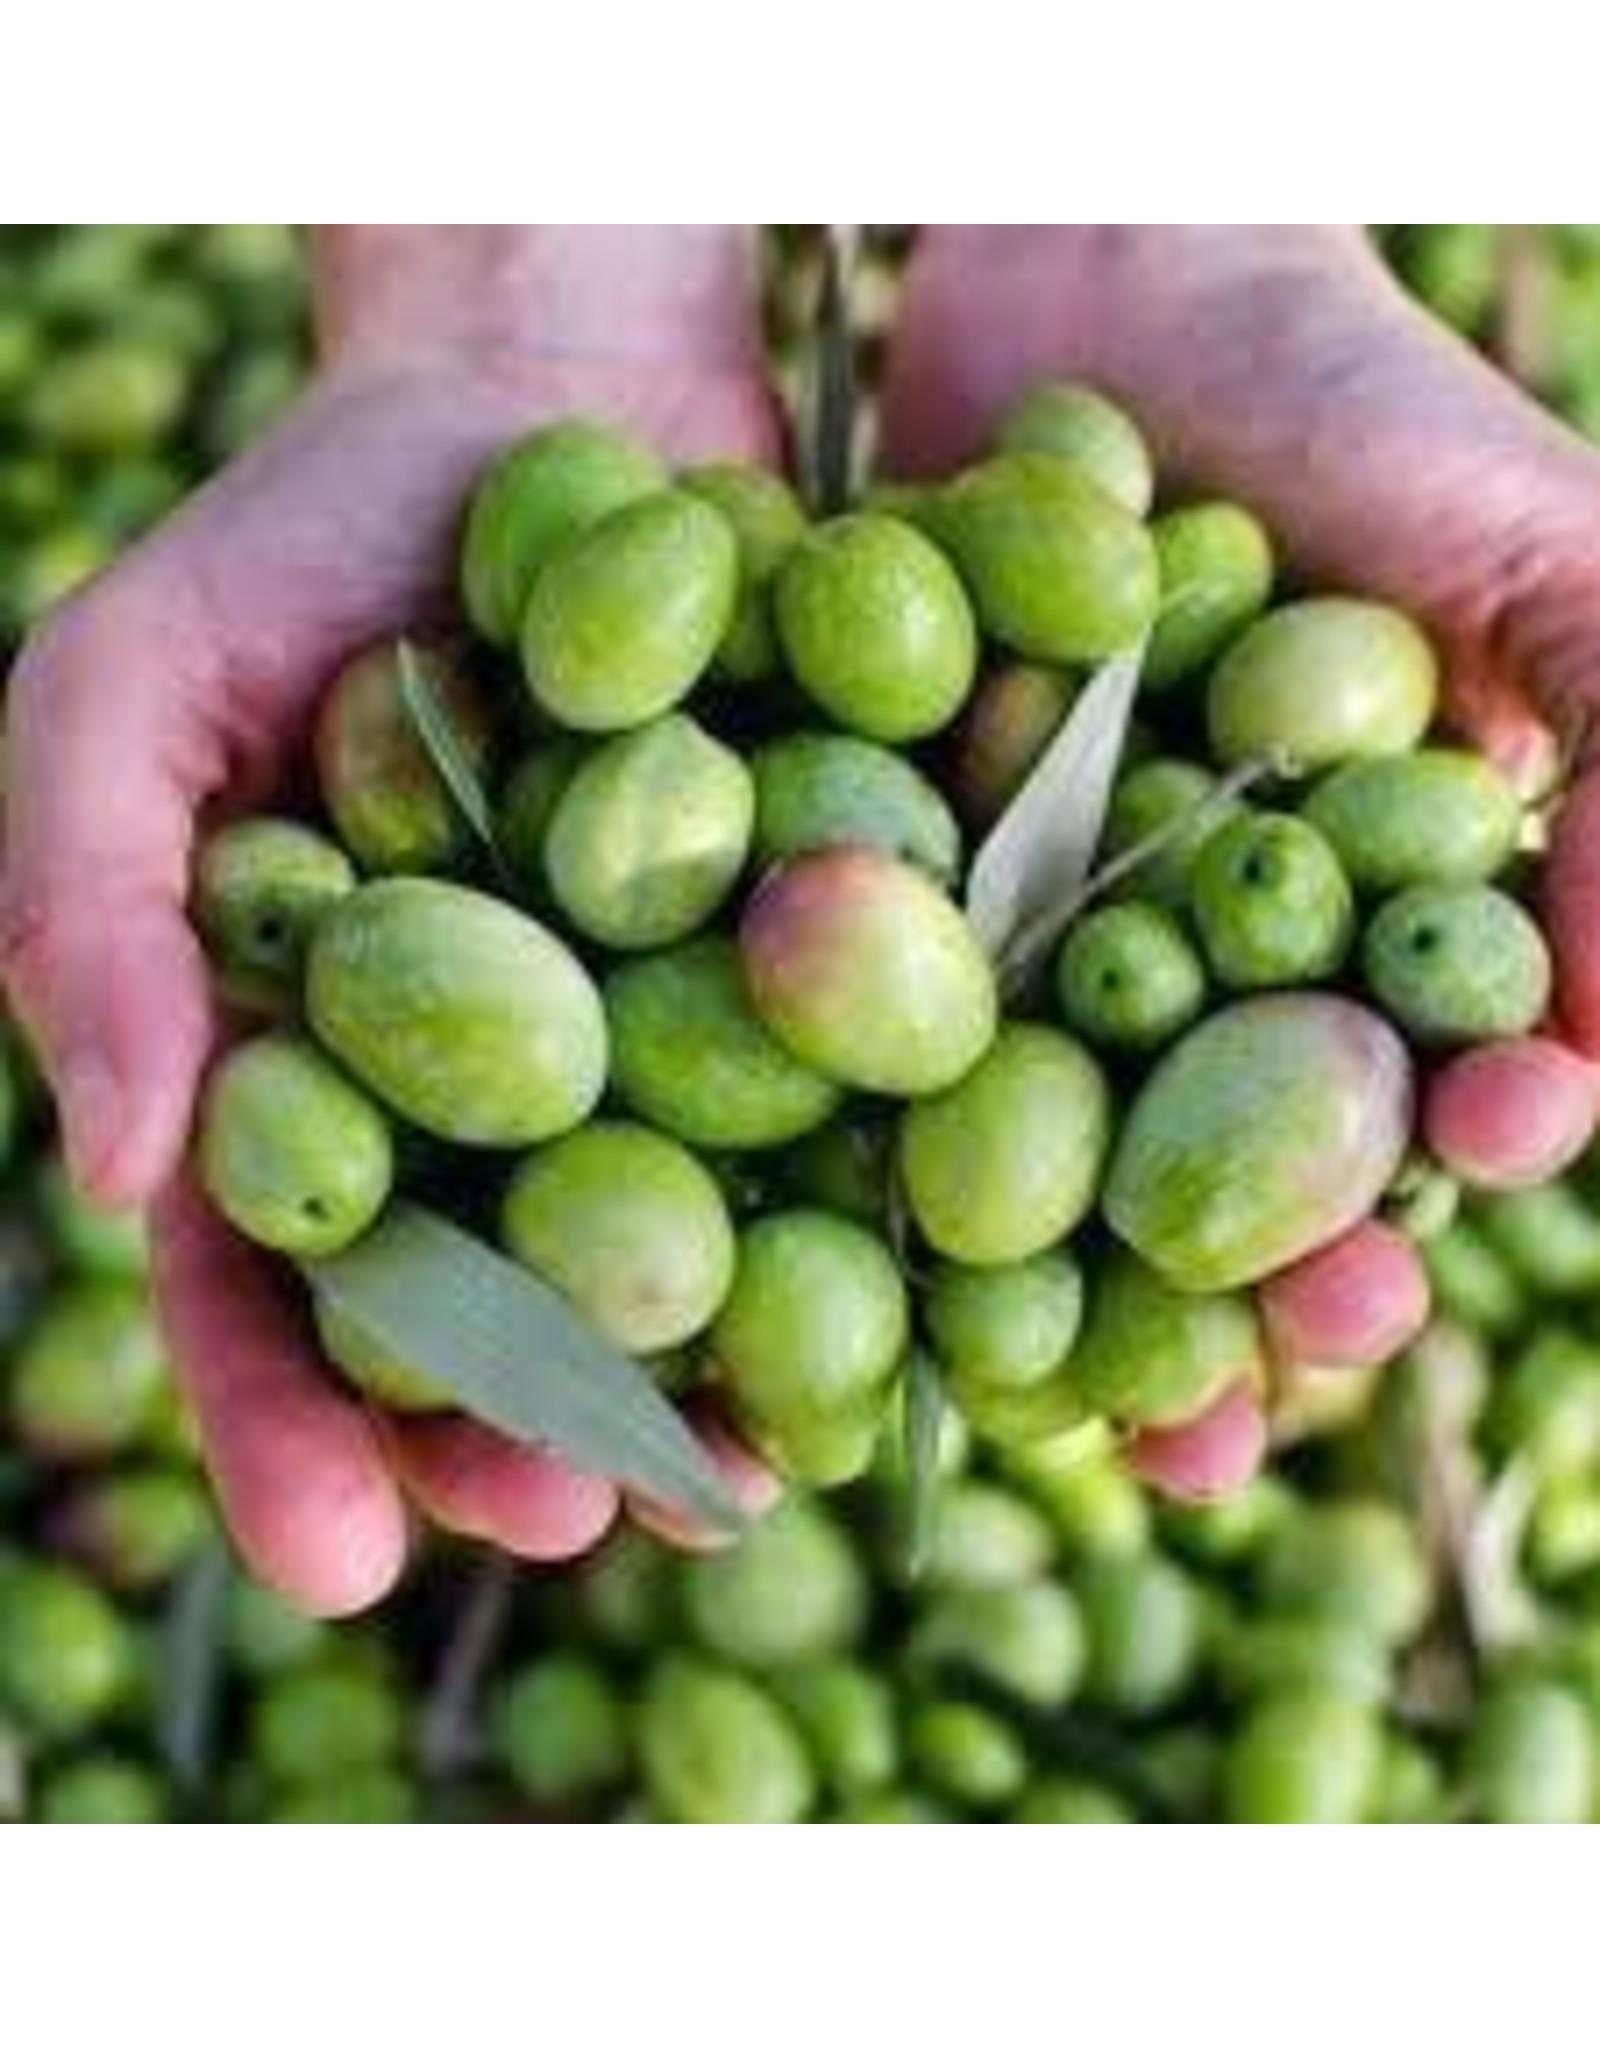 Organic Chetoui-Robust (Tunisia)Crush Date: Nov.2020